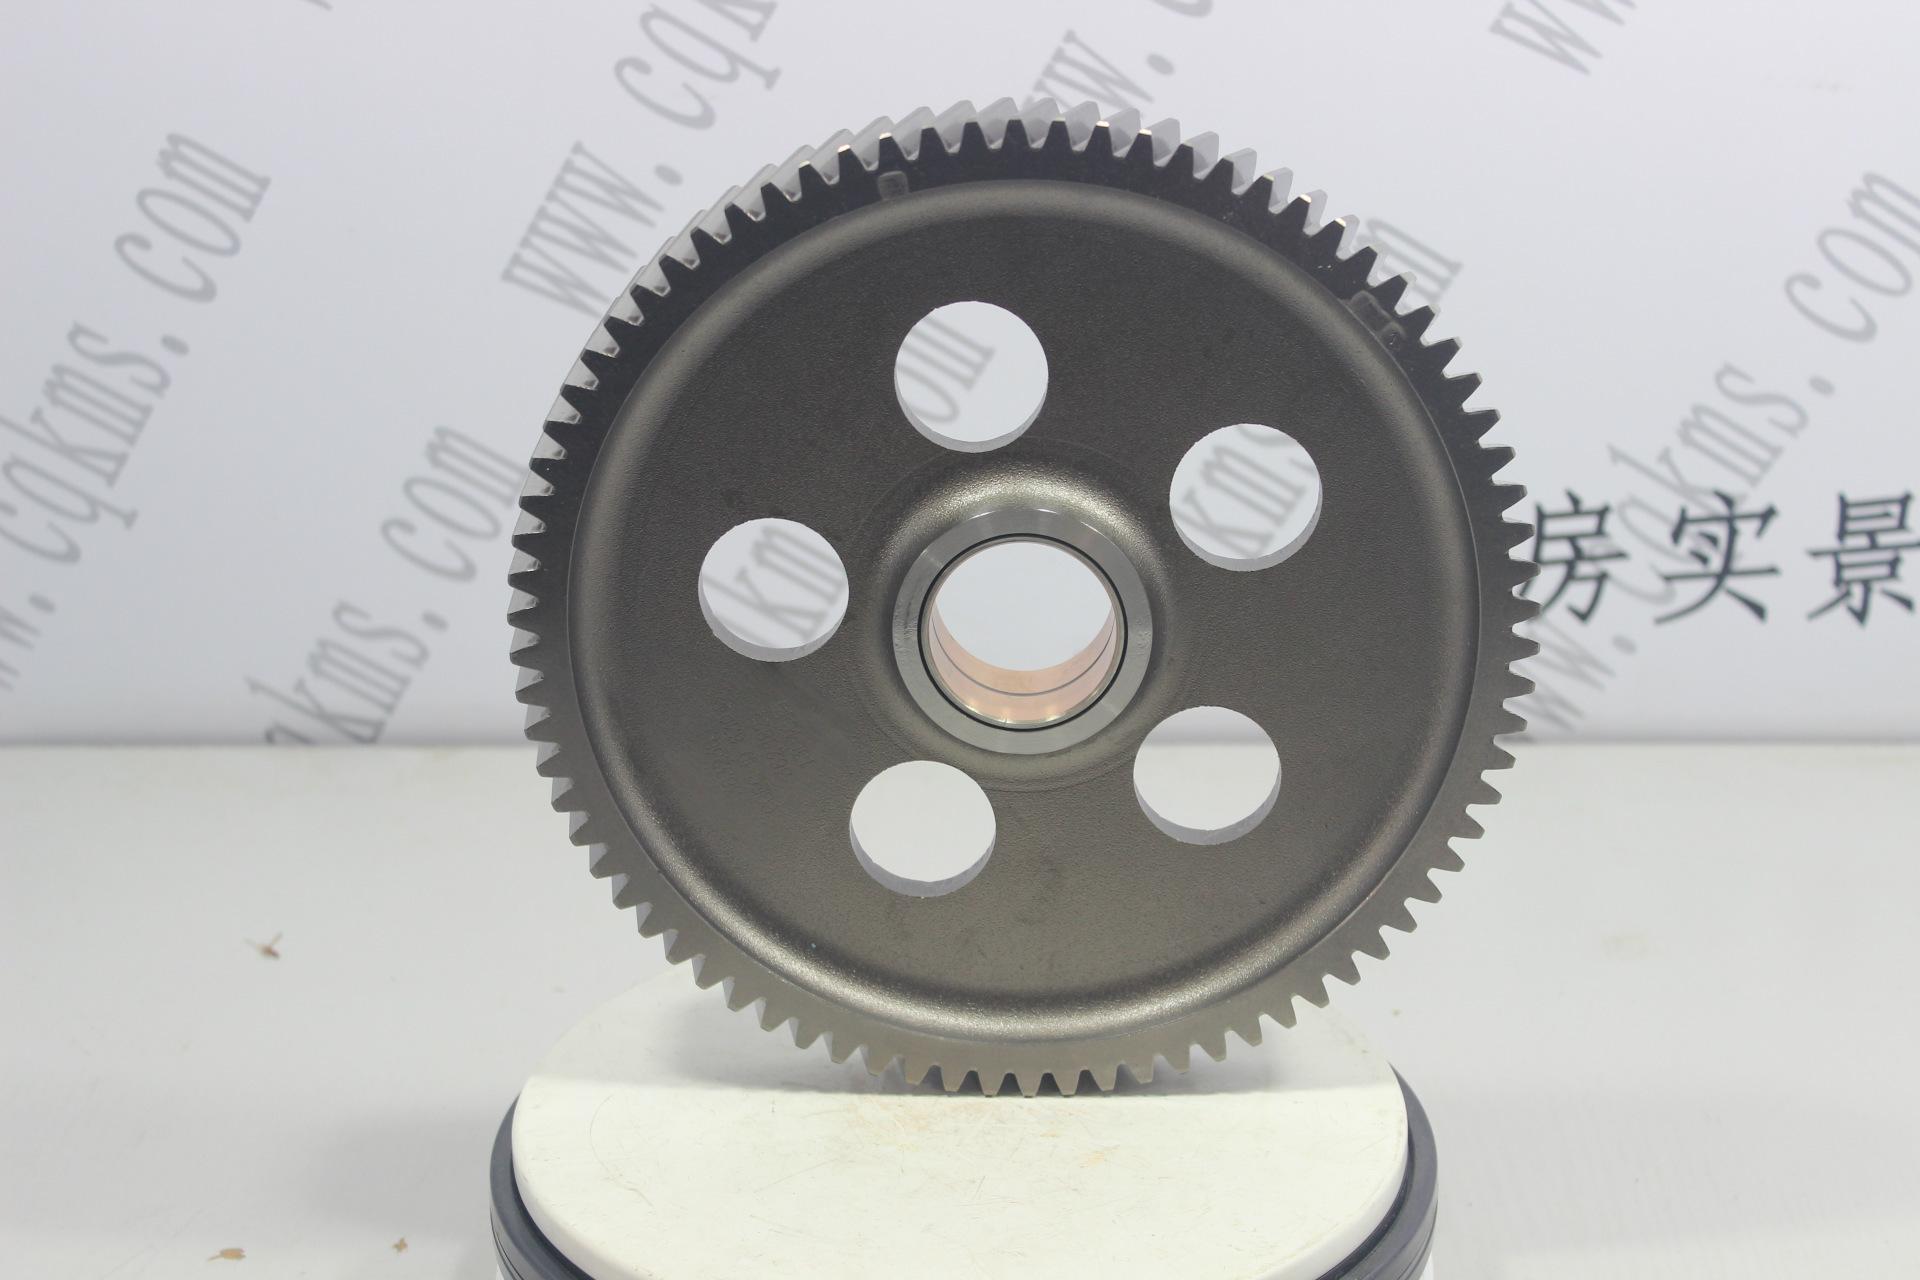 kms01100-3004593-水泵中间齿轮总成-用于k38康明斯发动机-k38-参考规格外径26.2cm,内径4.8cm,厚3cm-参考重量5.35kg-5.35kg图片2